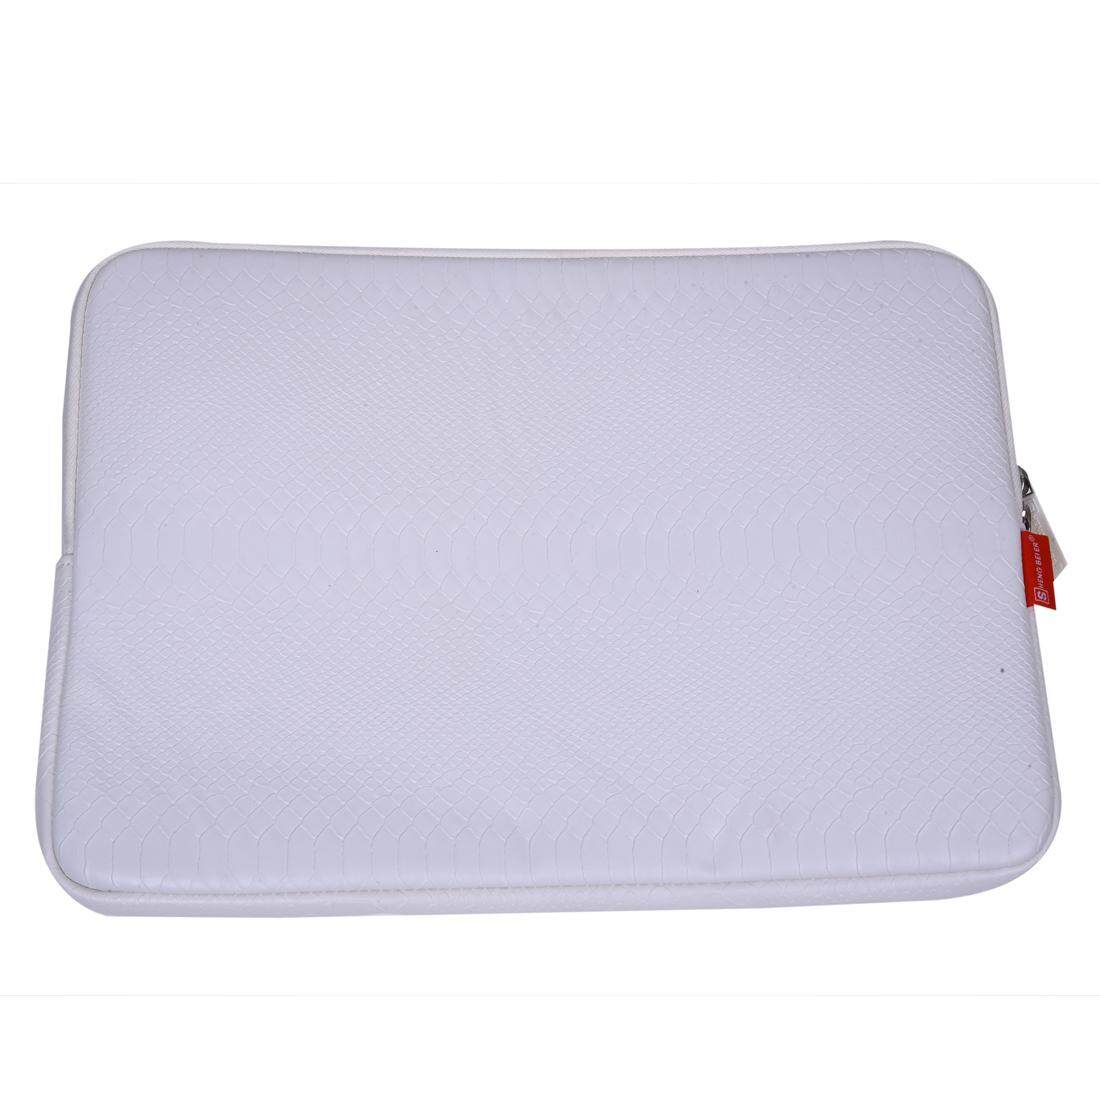 SHENG BEI ER Snake Skin Leather Sleeve Case 12 inch Laptop Bag,For MacBook Notebook Case Air Pro(White) - intl